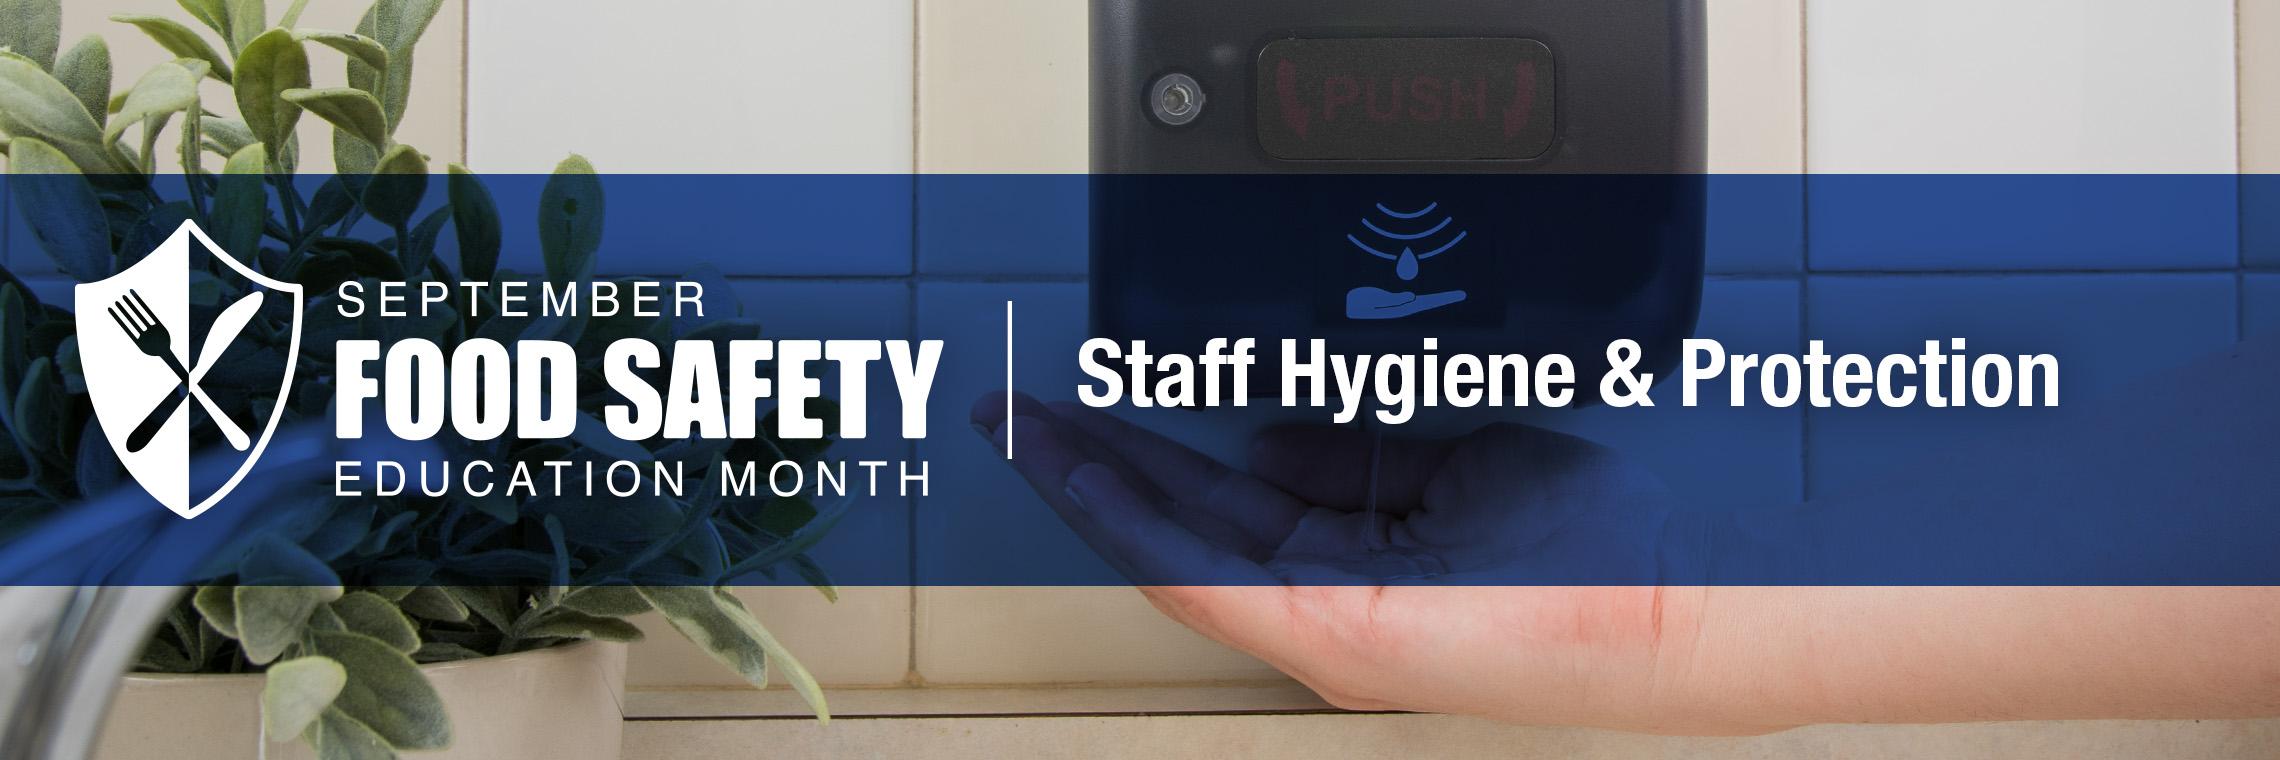 Staff Hygiene & Protection